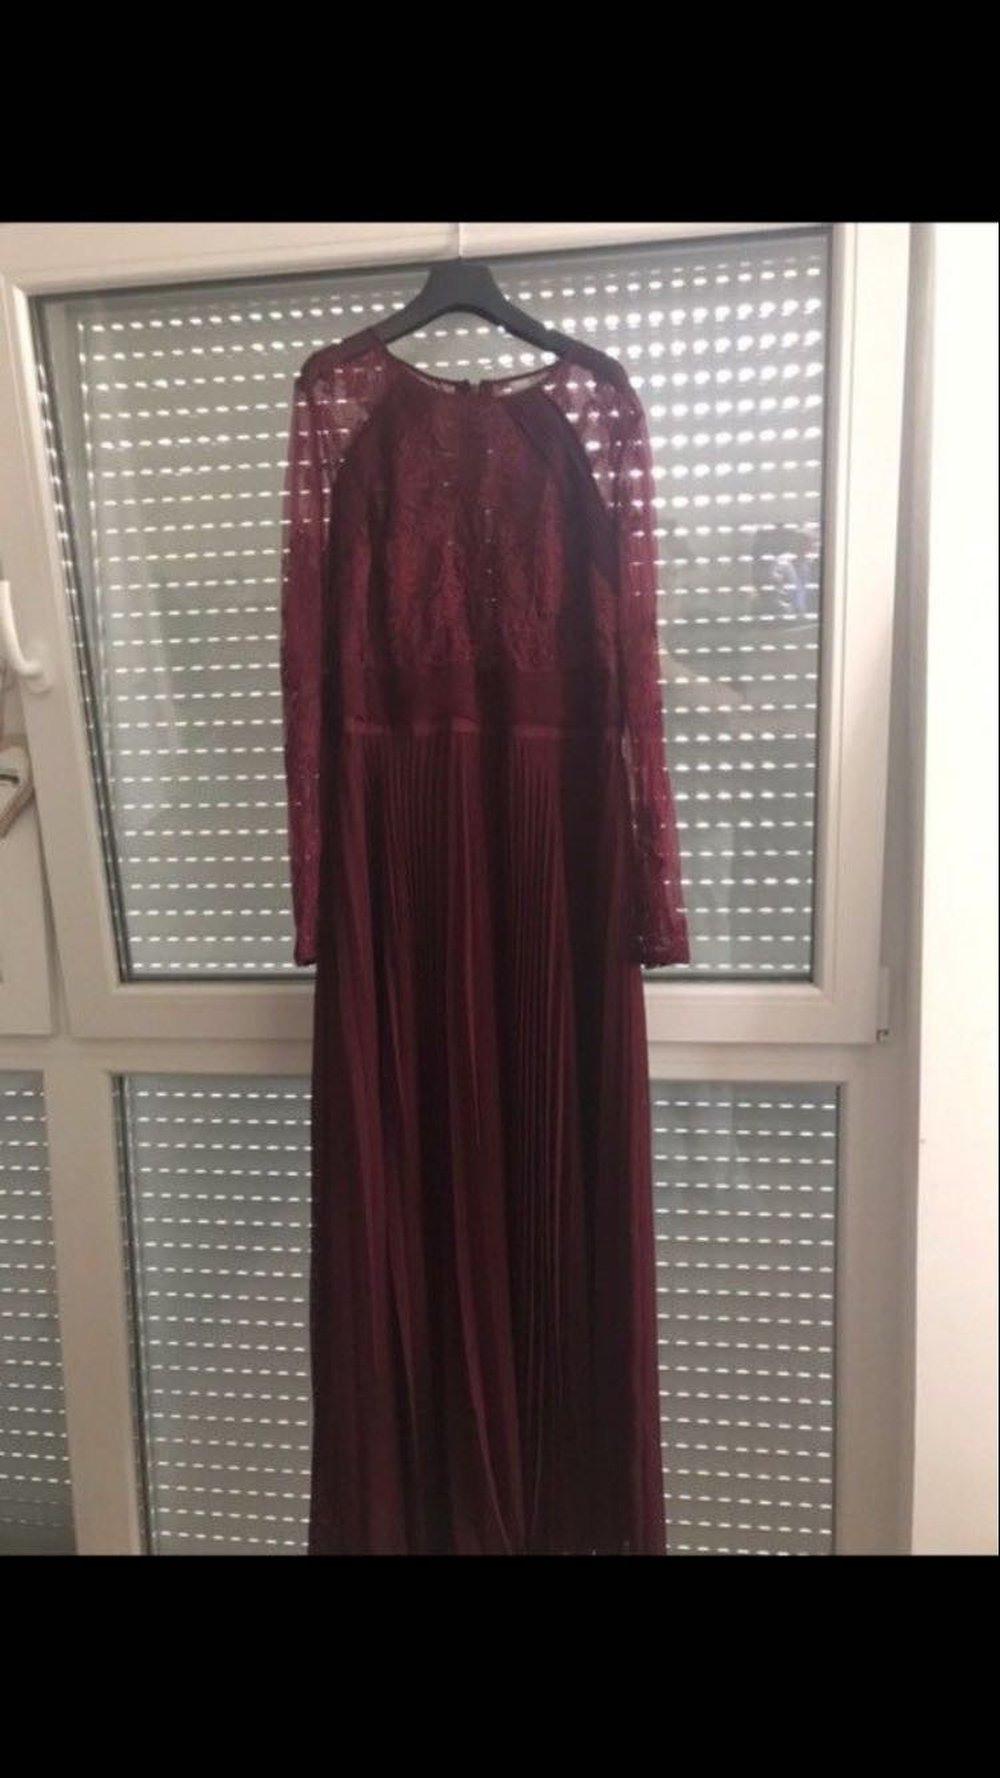 17 Spektakulär Abendkleid In 46 Ärmel10 Spektakulär Abendkleid In 46 Spezialgebiet